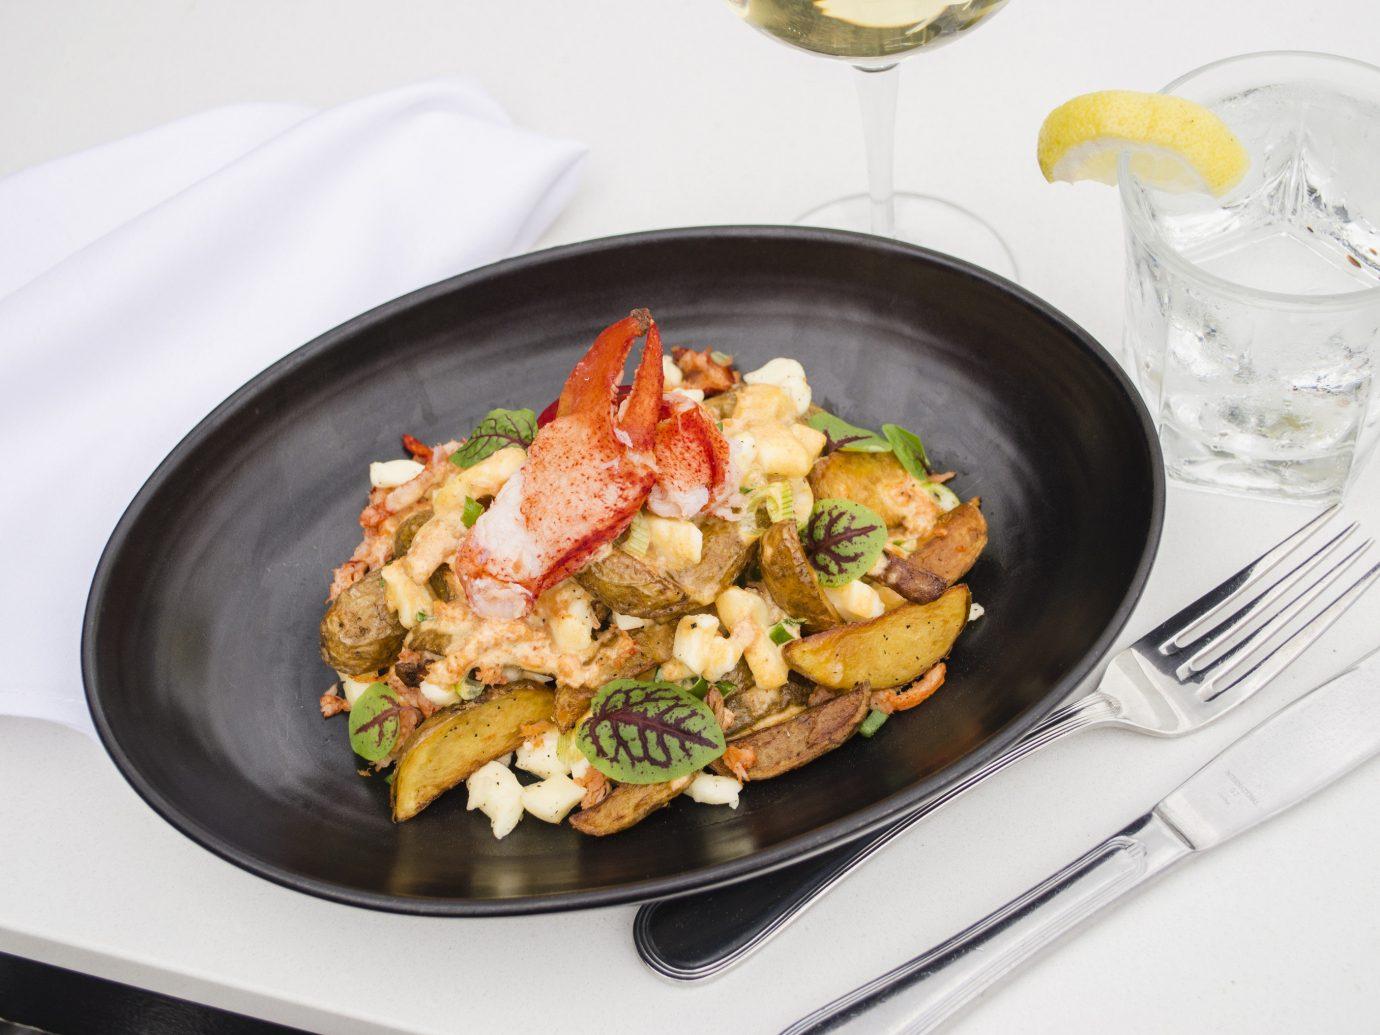 Trip Ideas food plate dish cuisine meal Seafood breakfast vegetarian food recipe vegetable